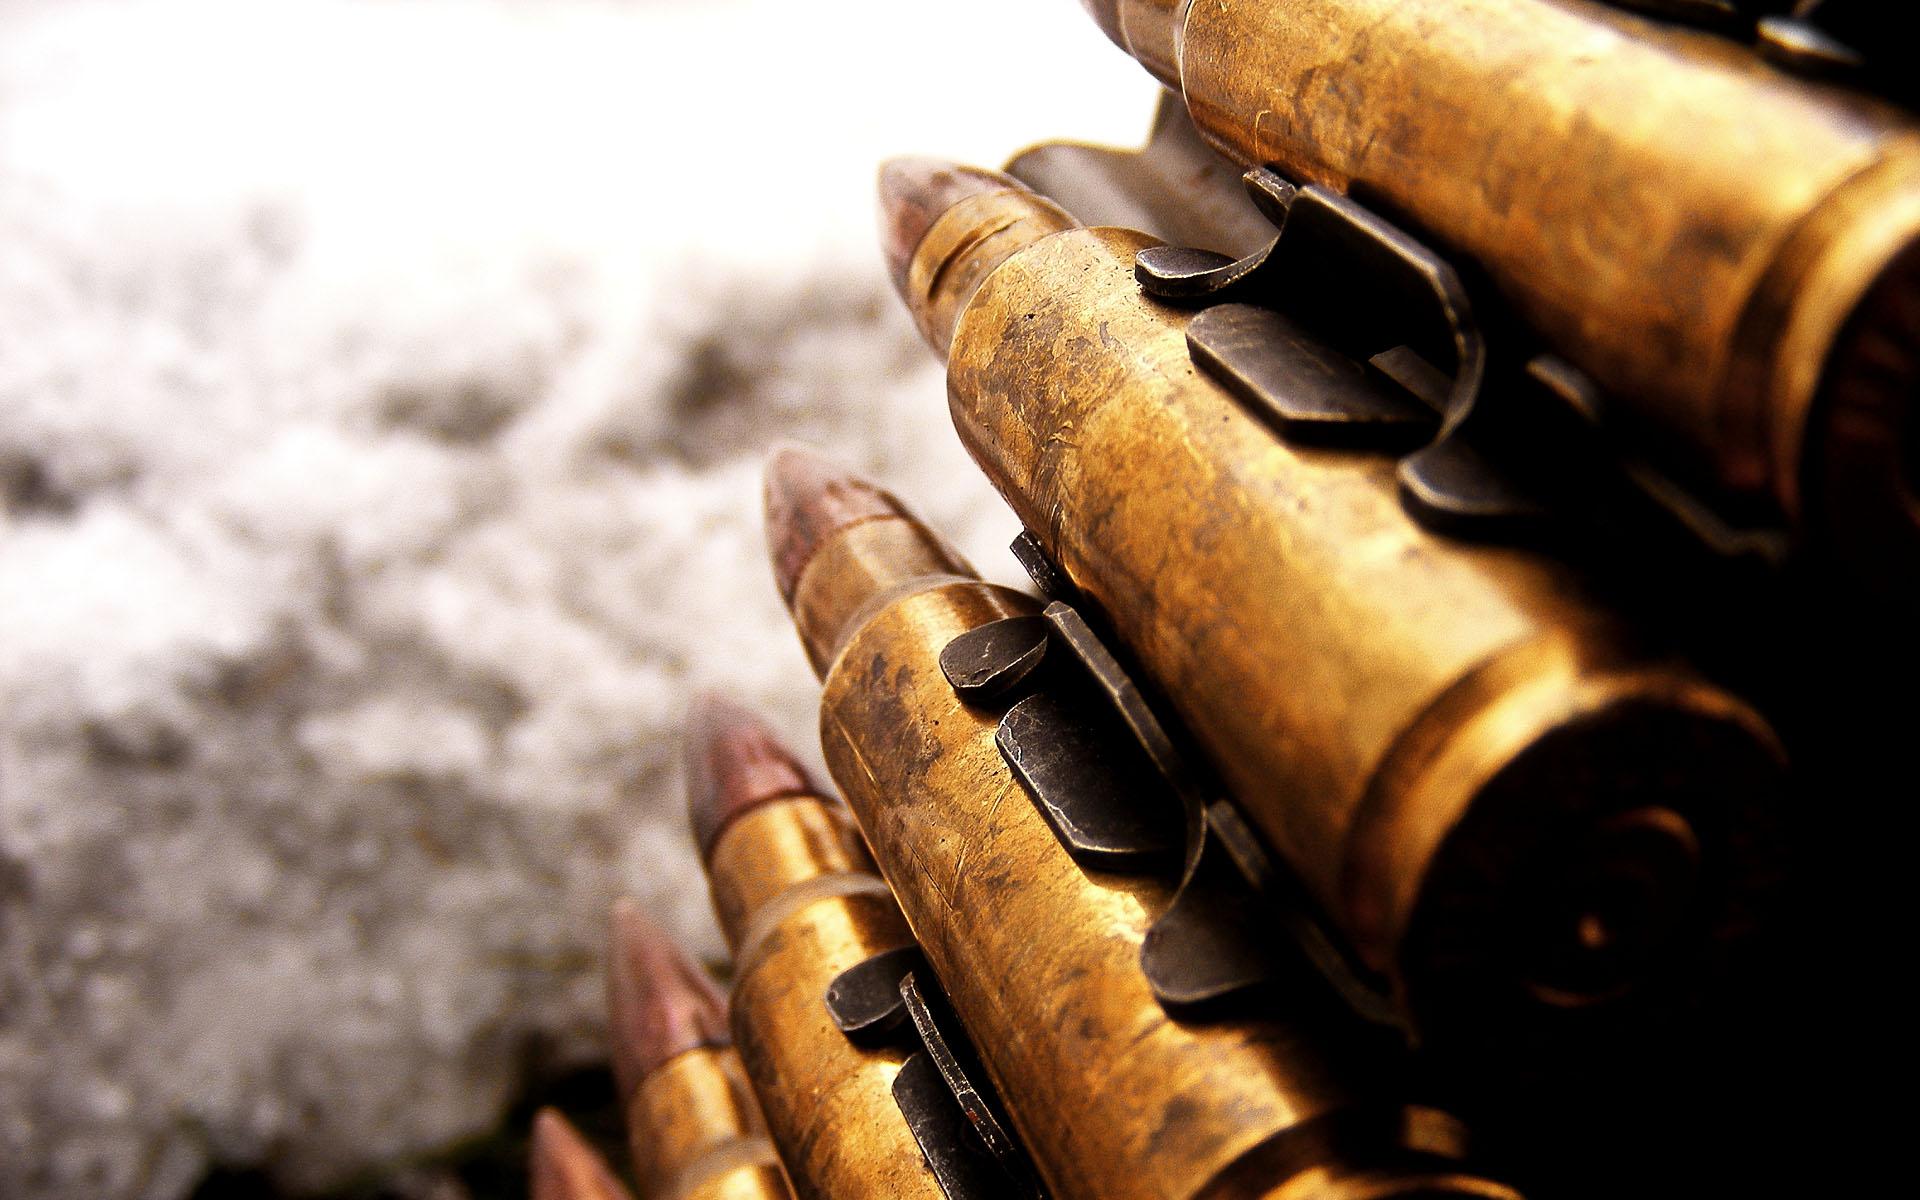 high quality 1920x1200 Roundup 40 Great Military And Guns Hd HD Wallpaper